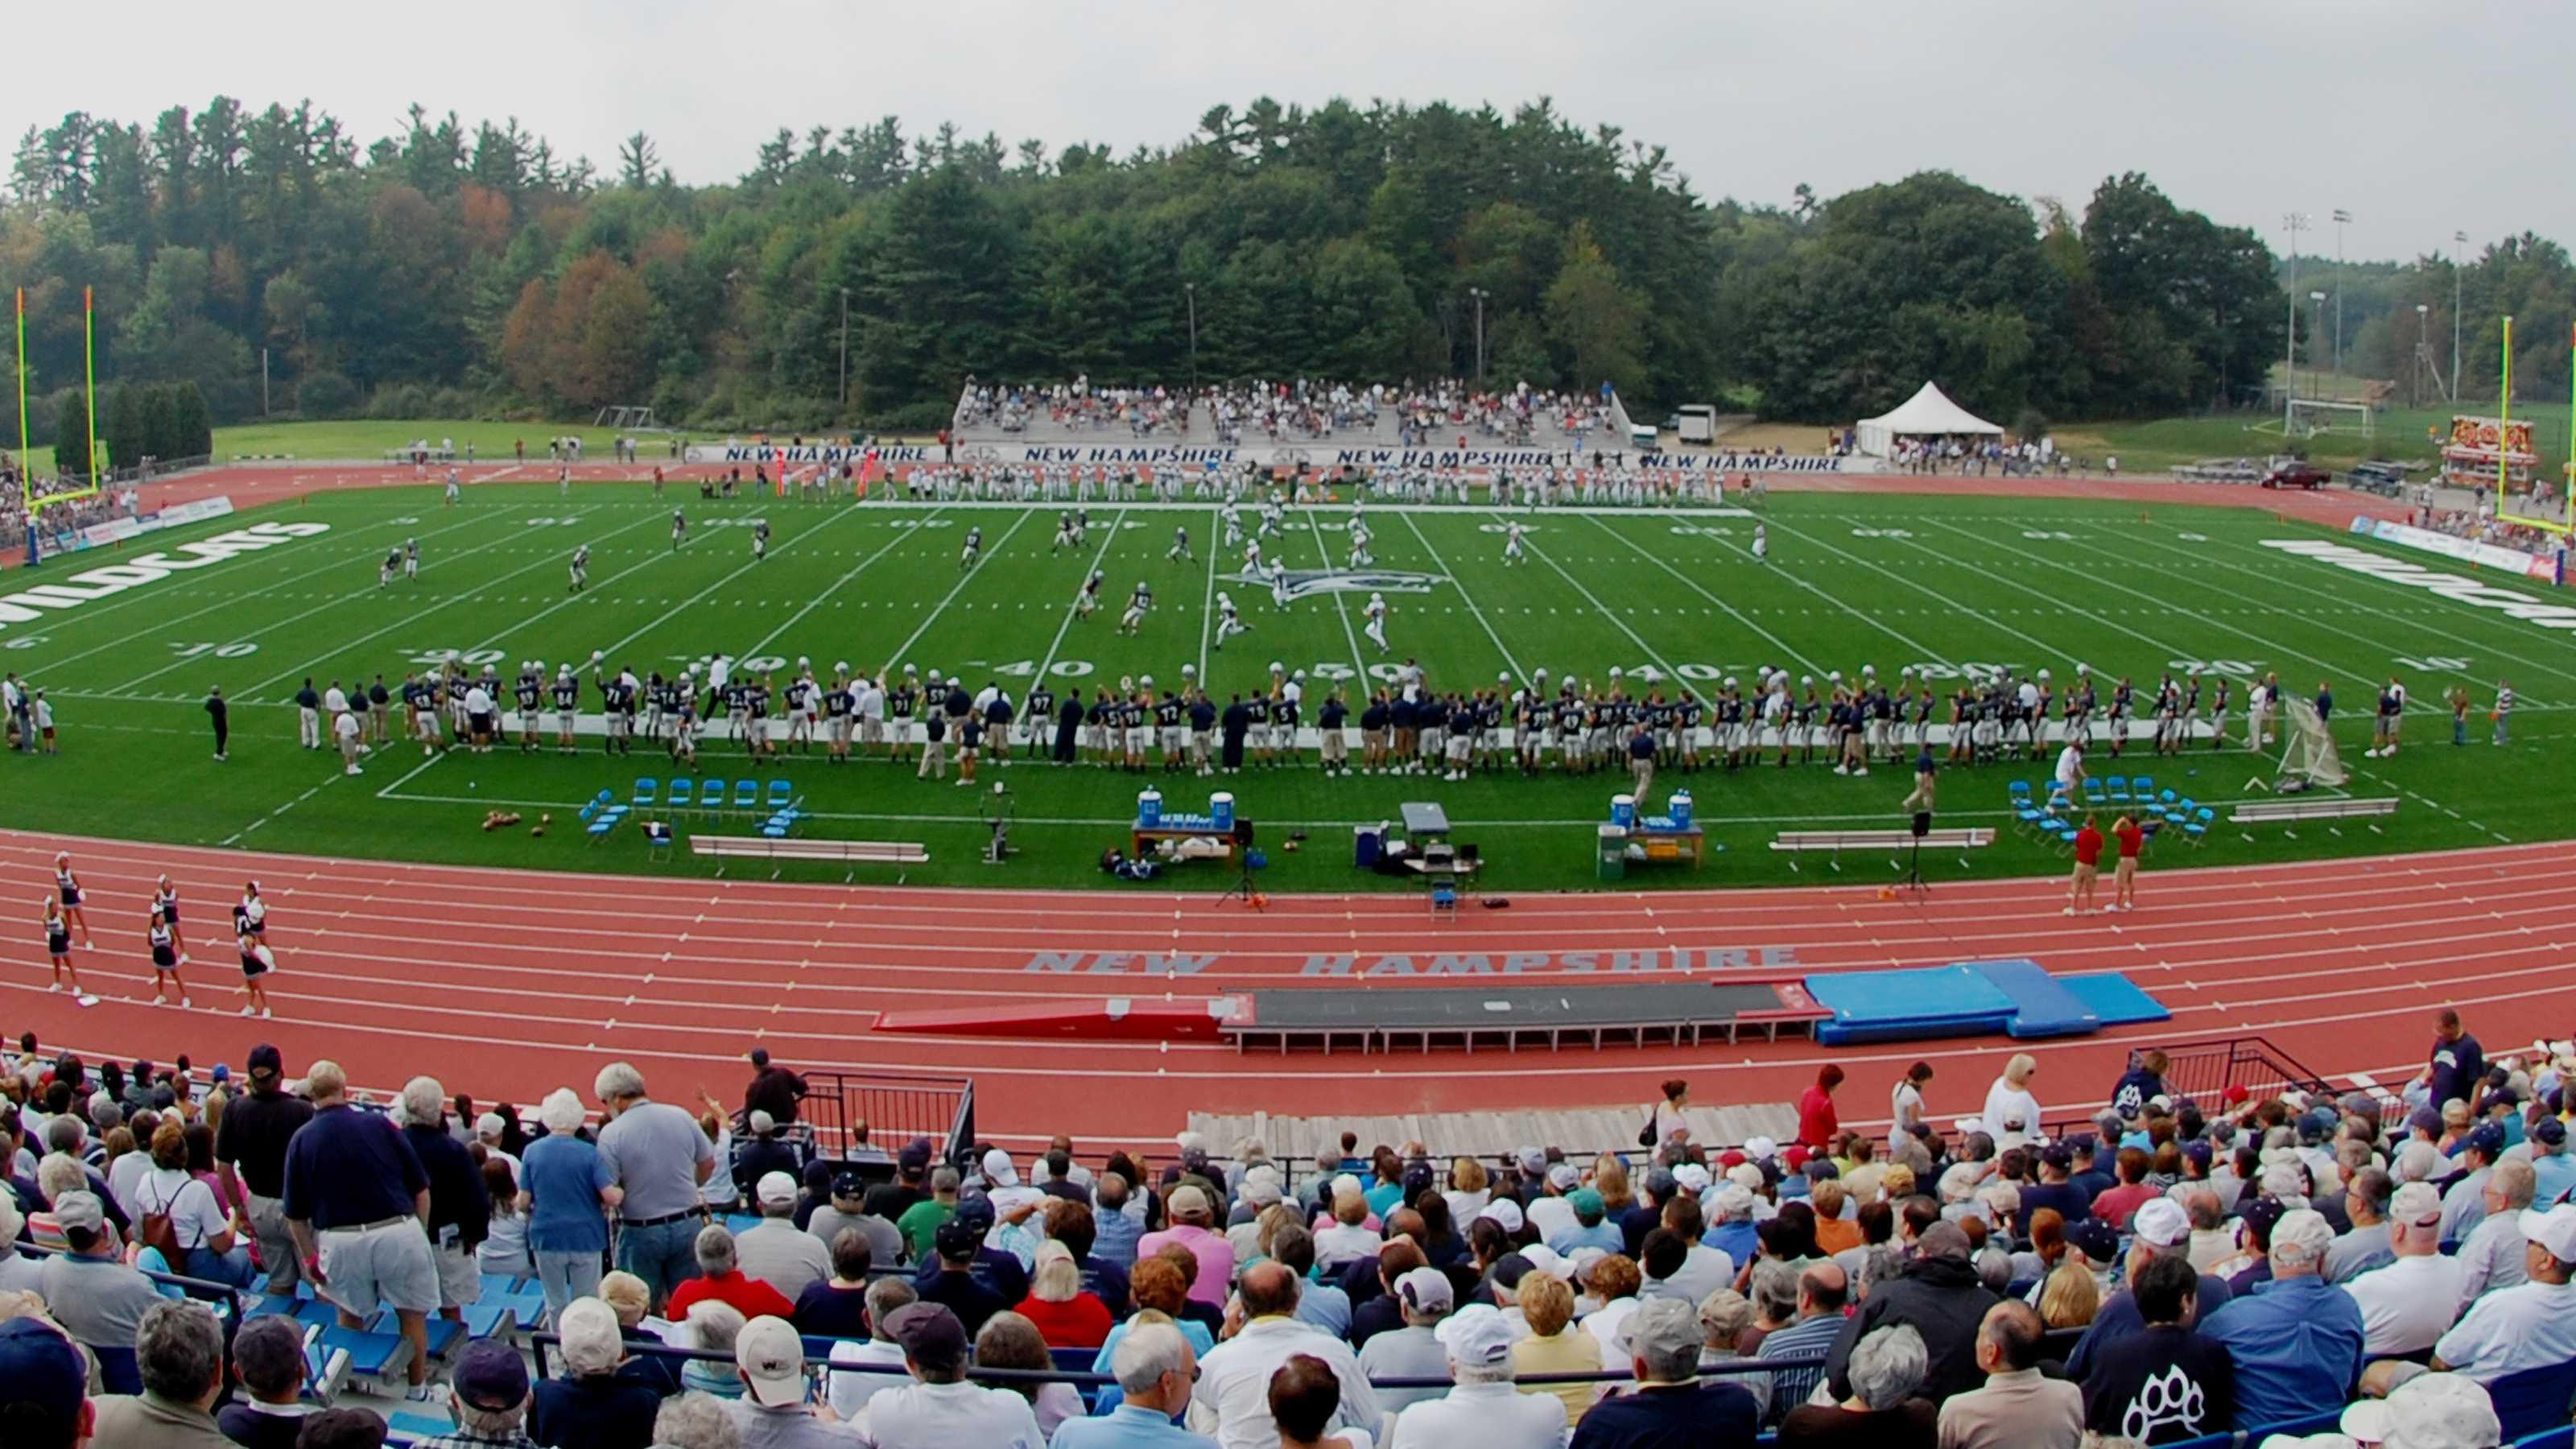 cowell stadium